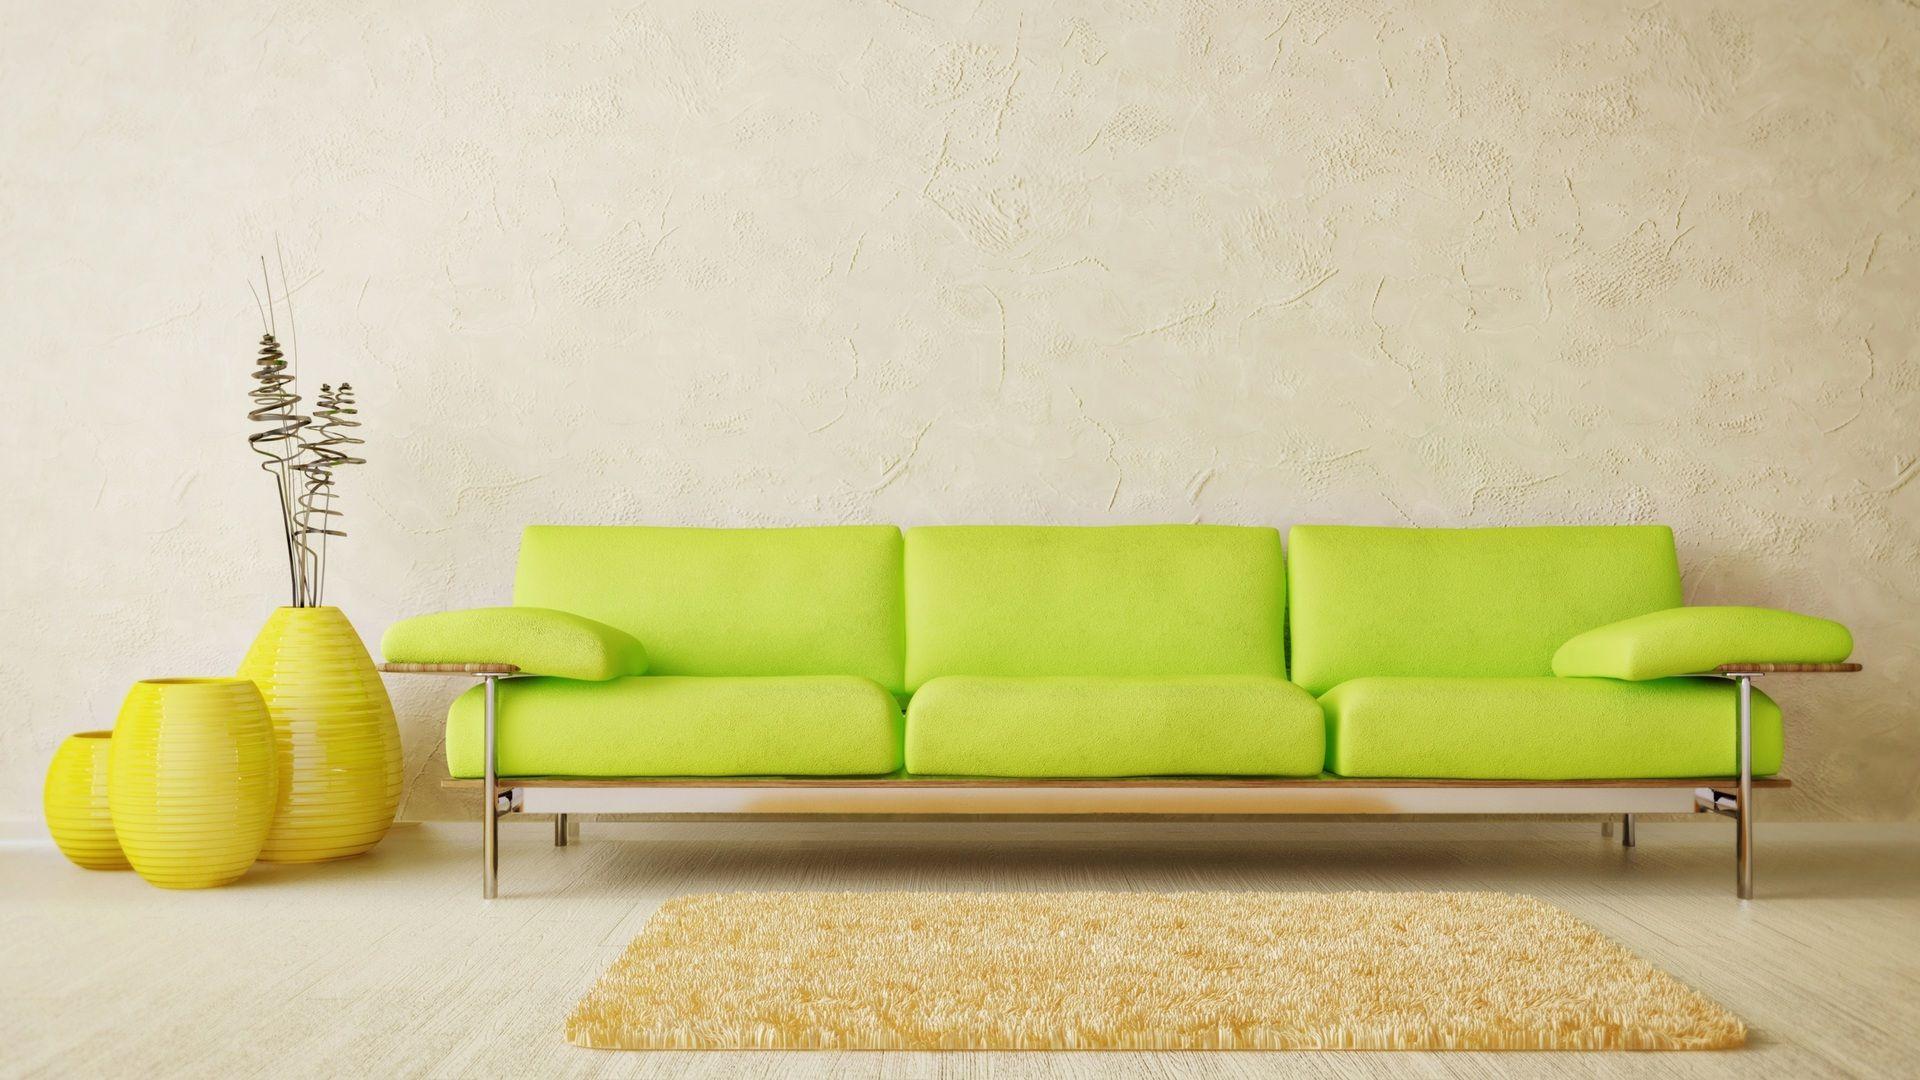 Furniture full hd wallpaper